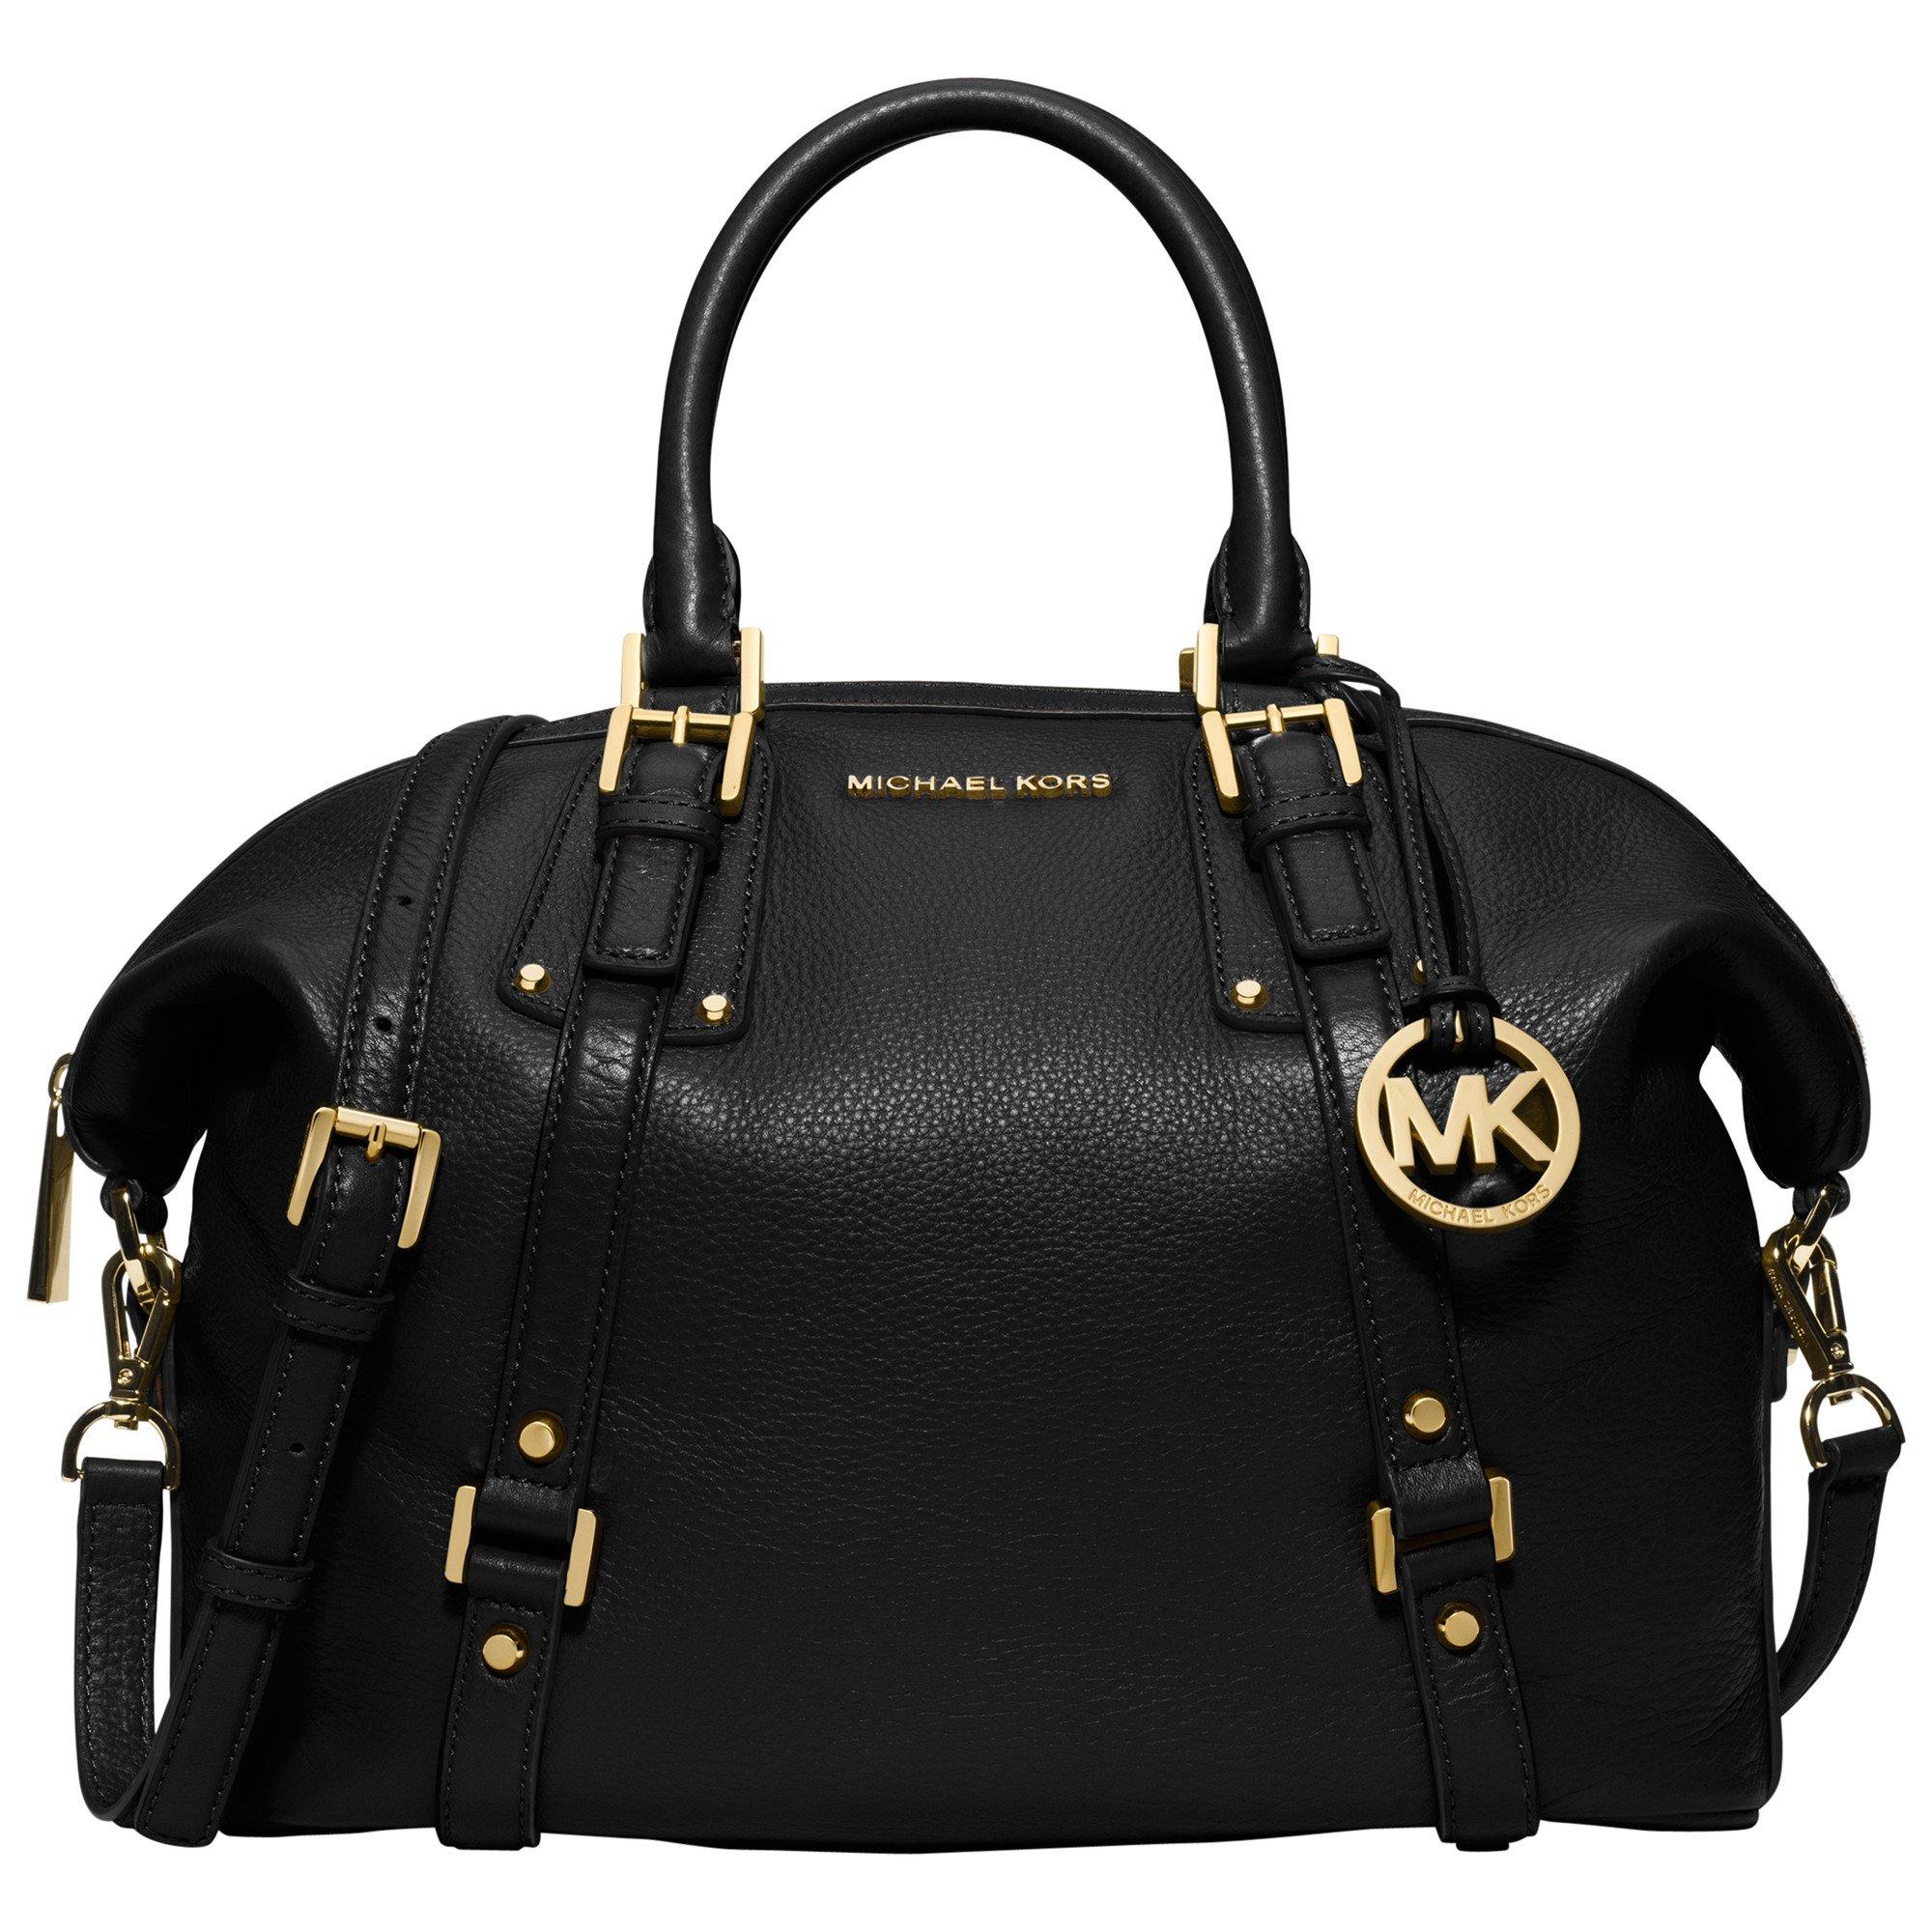 1d08dc3e8edc MICHAEL Michael Kors Bedford Belted Large Leather Satchel in Black ...